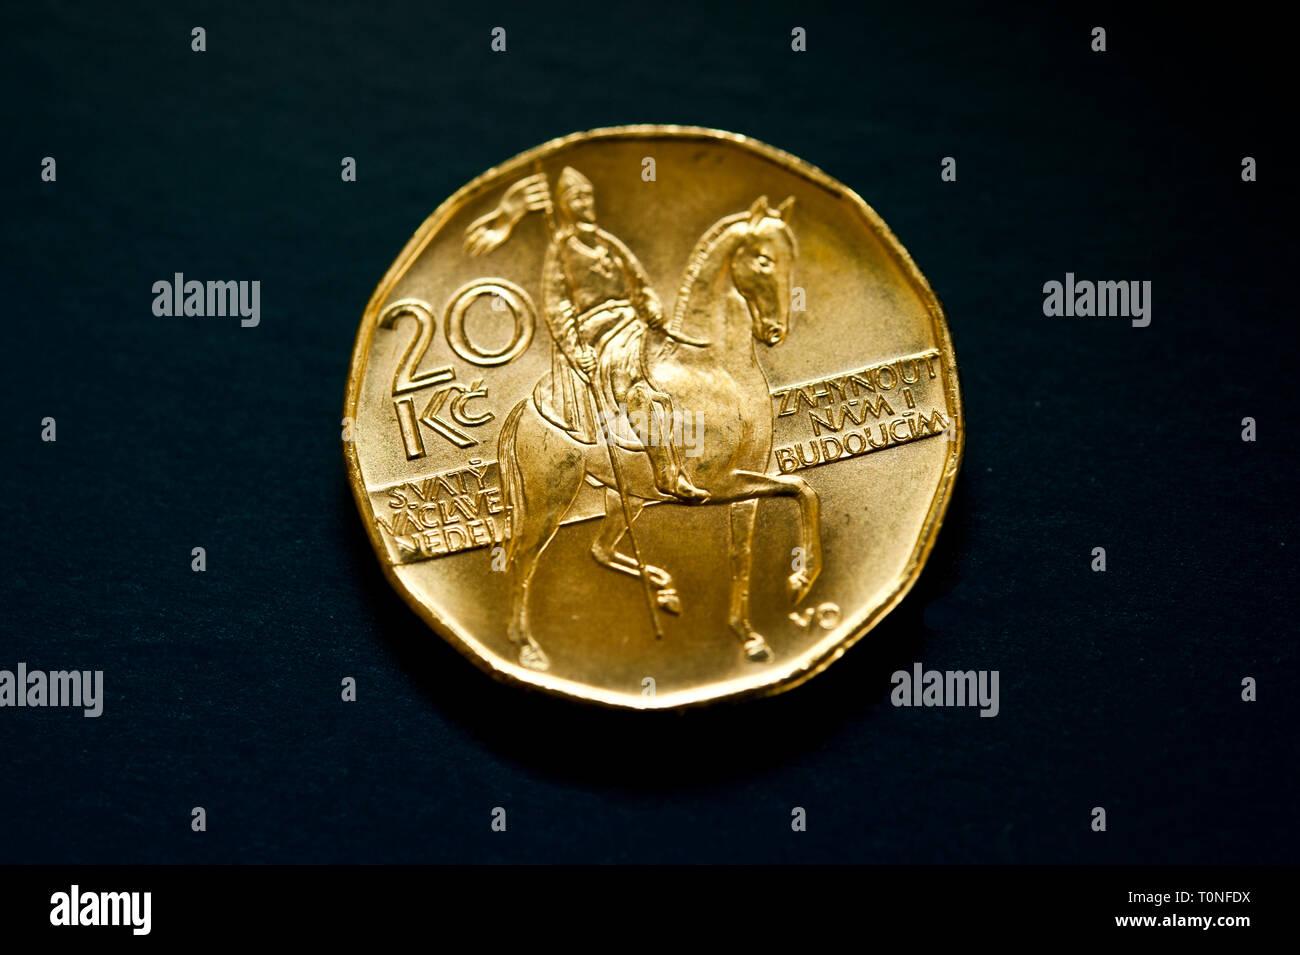 Czech Republic coin 20 crowns - Stock Image